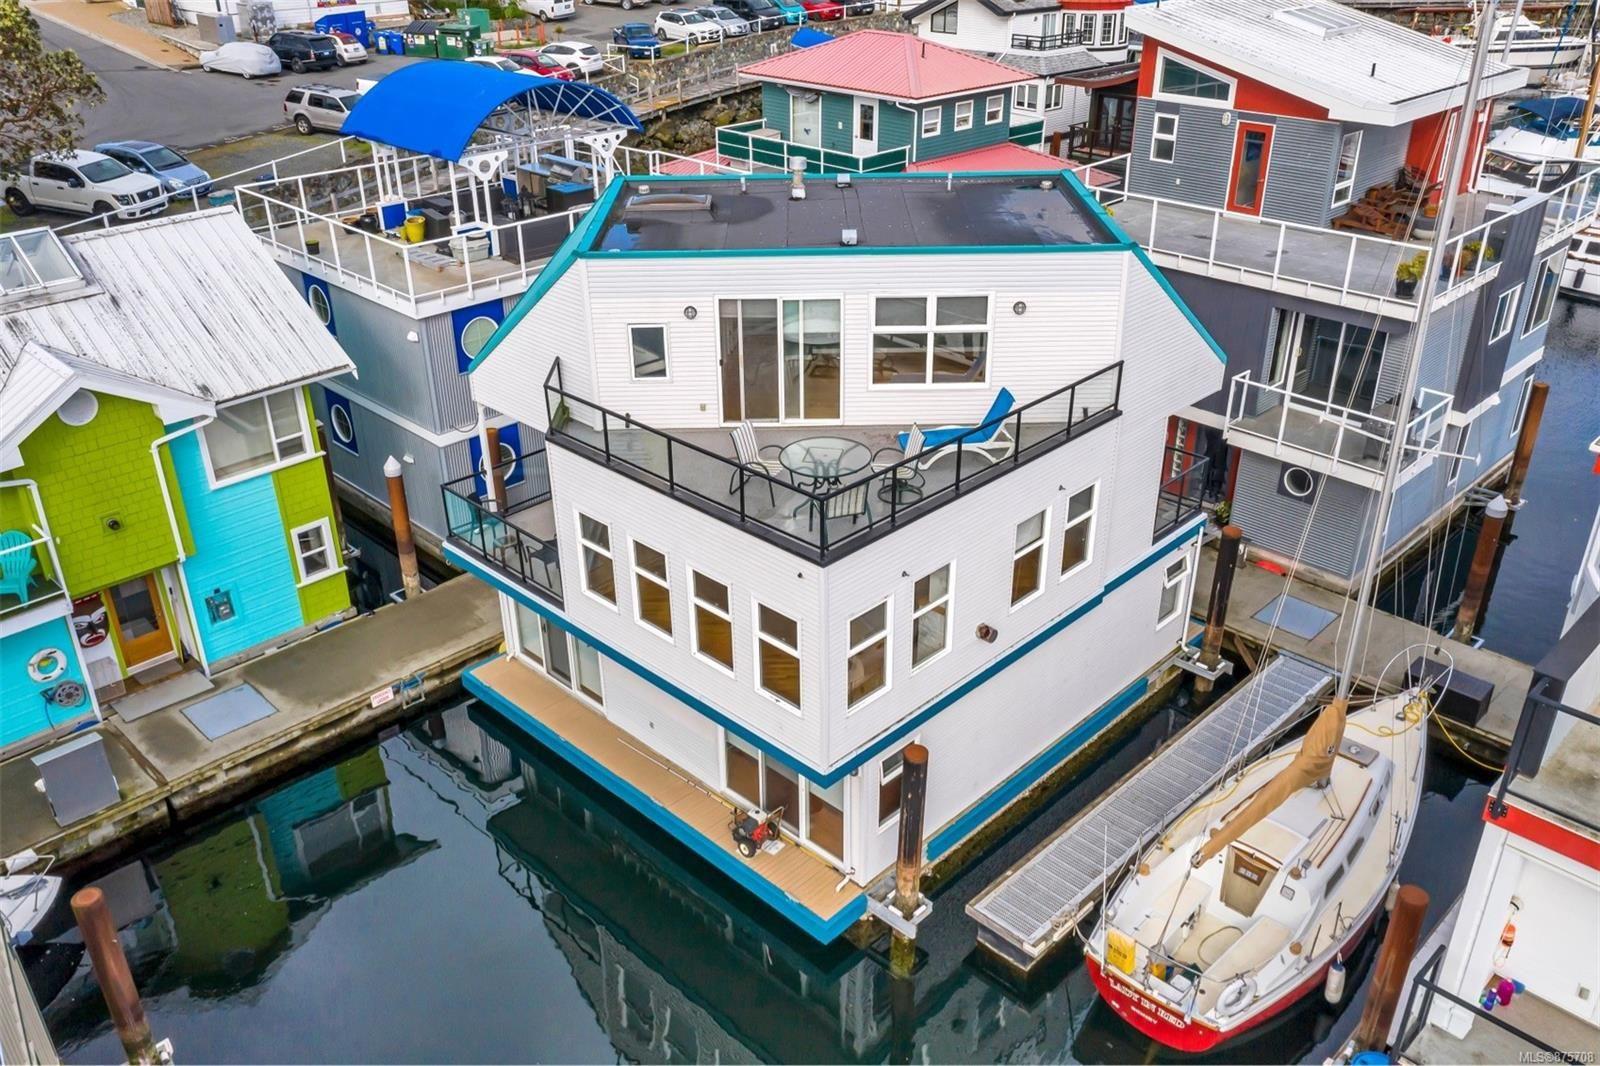 Main Photo: A26 453 Head St in : Es Old Esquimalt House for sale (Esquimalt)  : MLS®# 875708